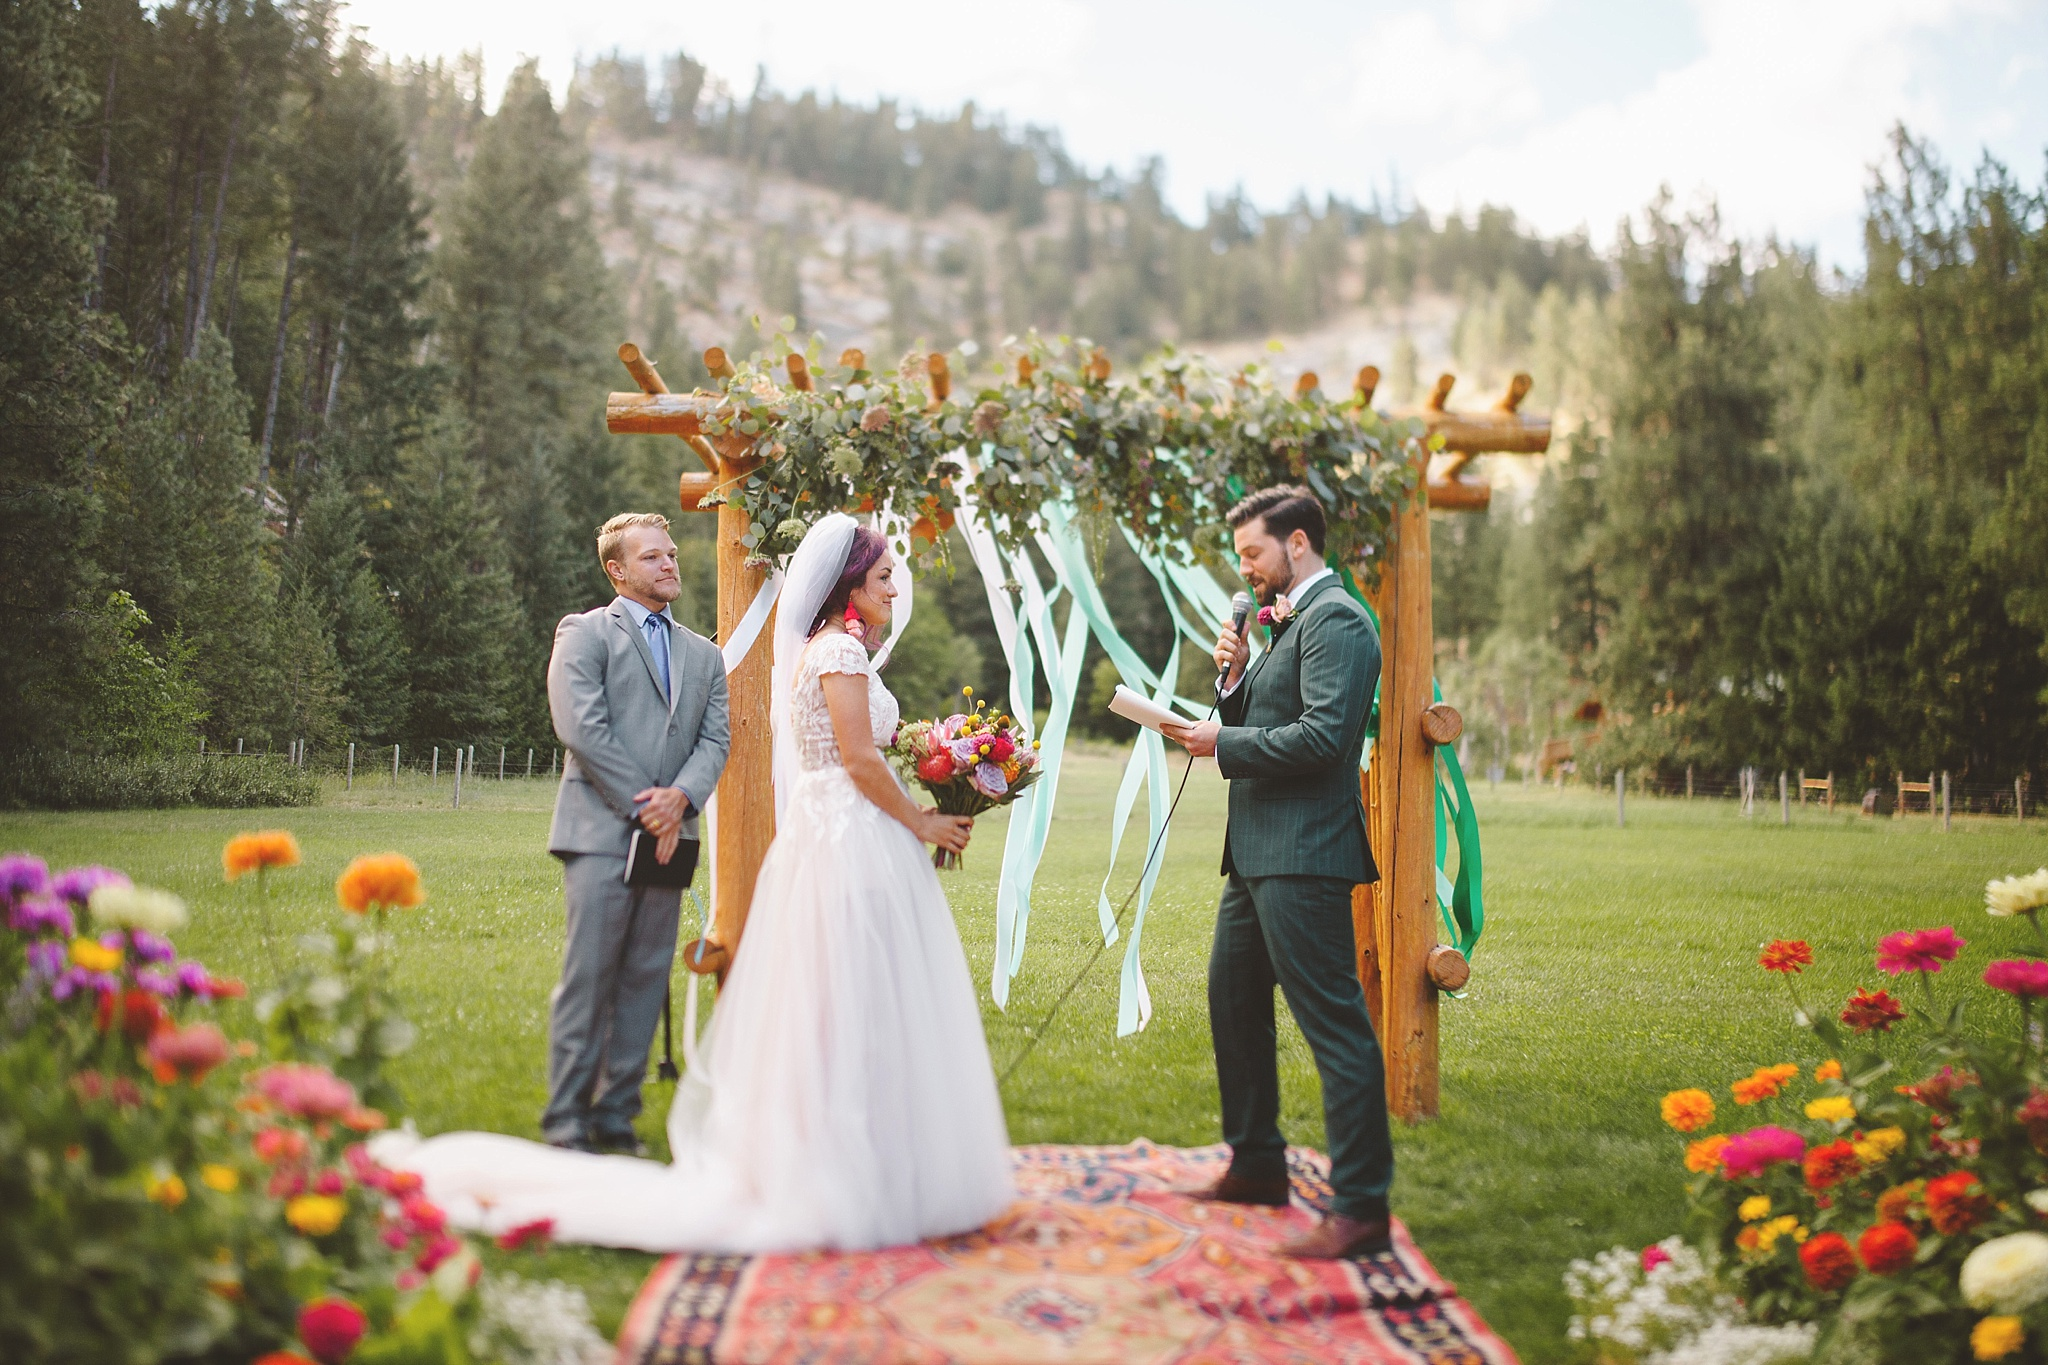 bohemian wedding ceremony in seattle